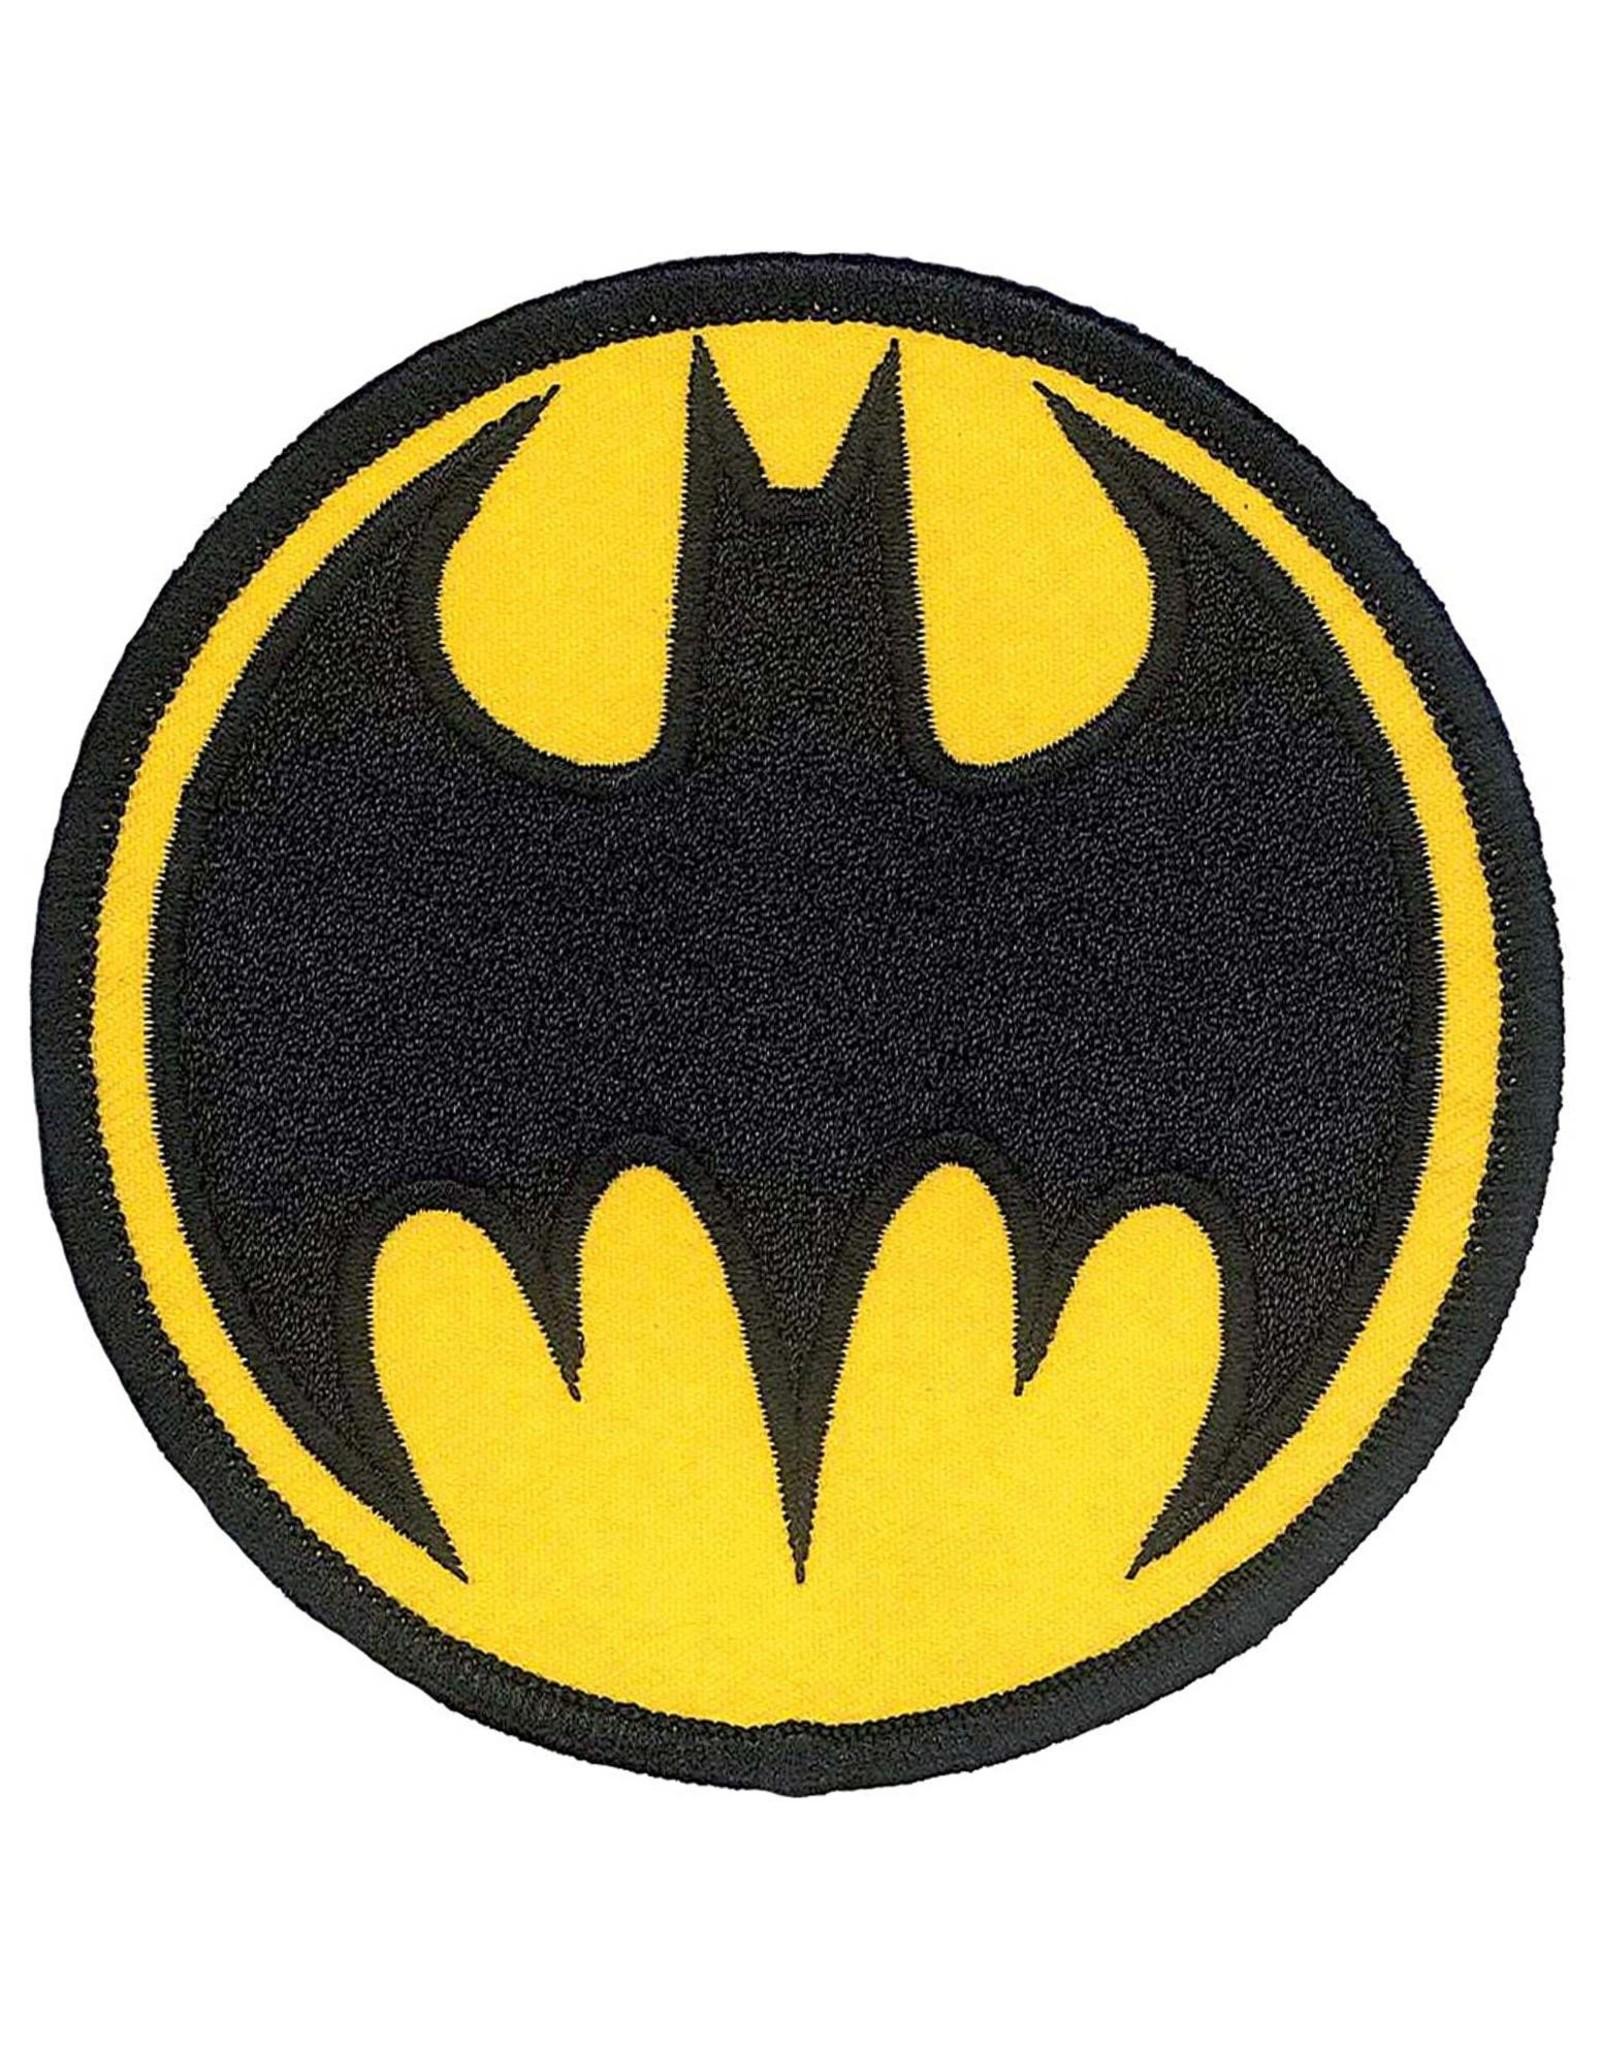 Ata-boy BATMAN SIGNAL IRON-ON PATCH